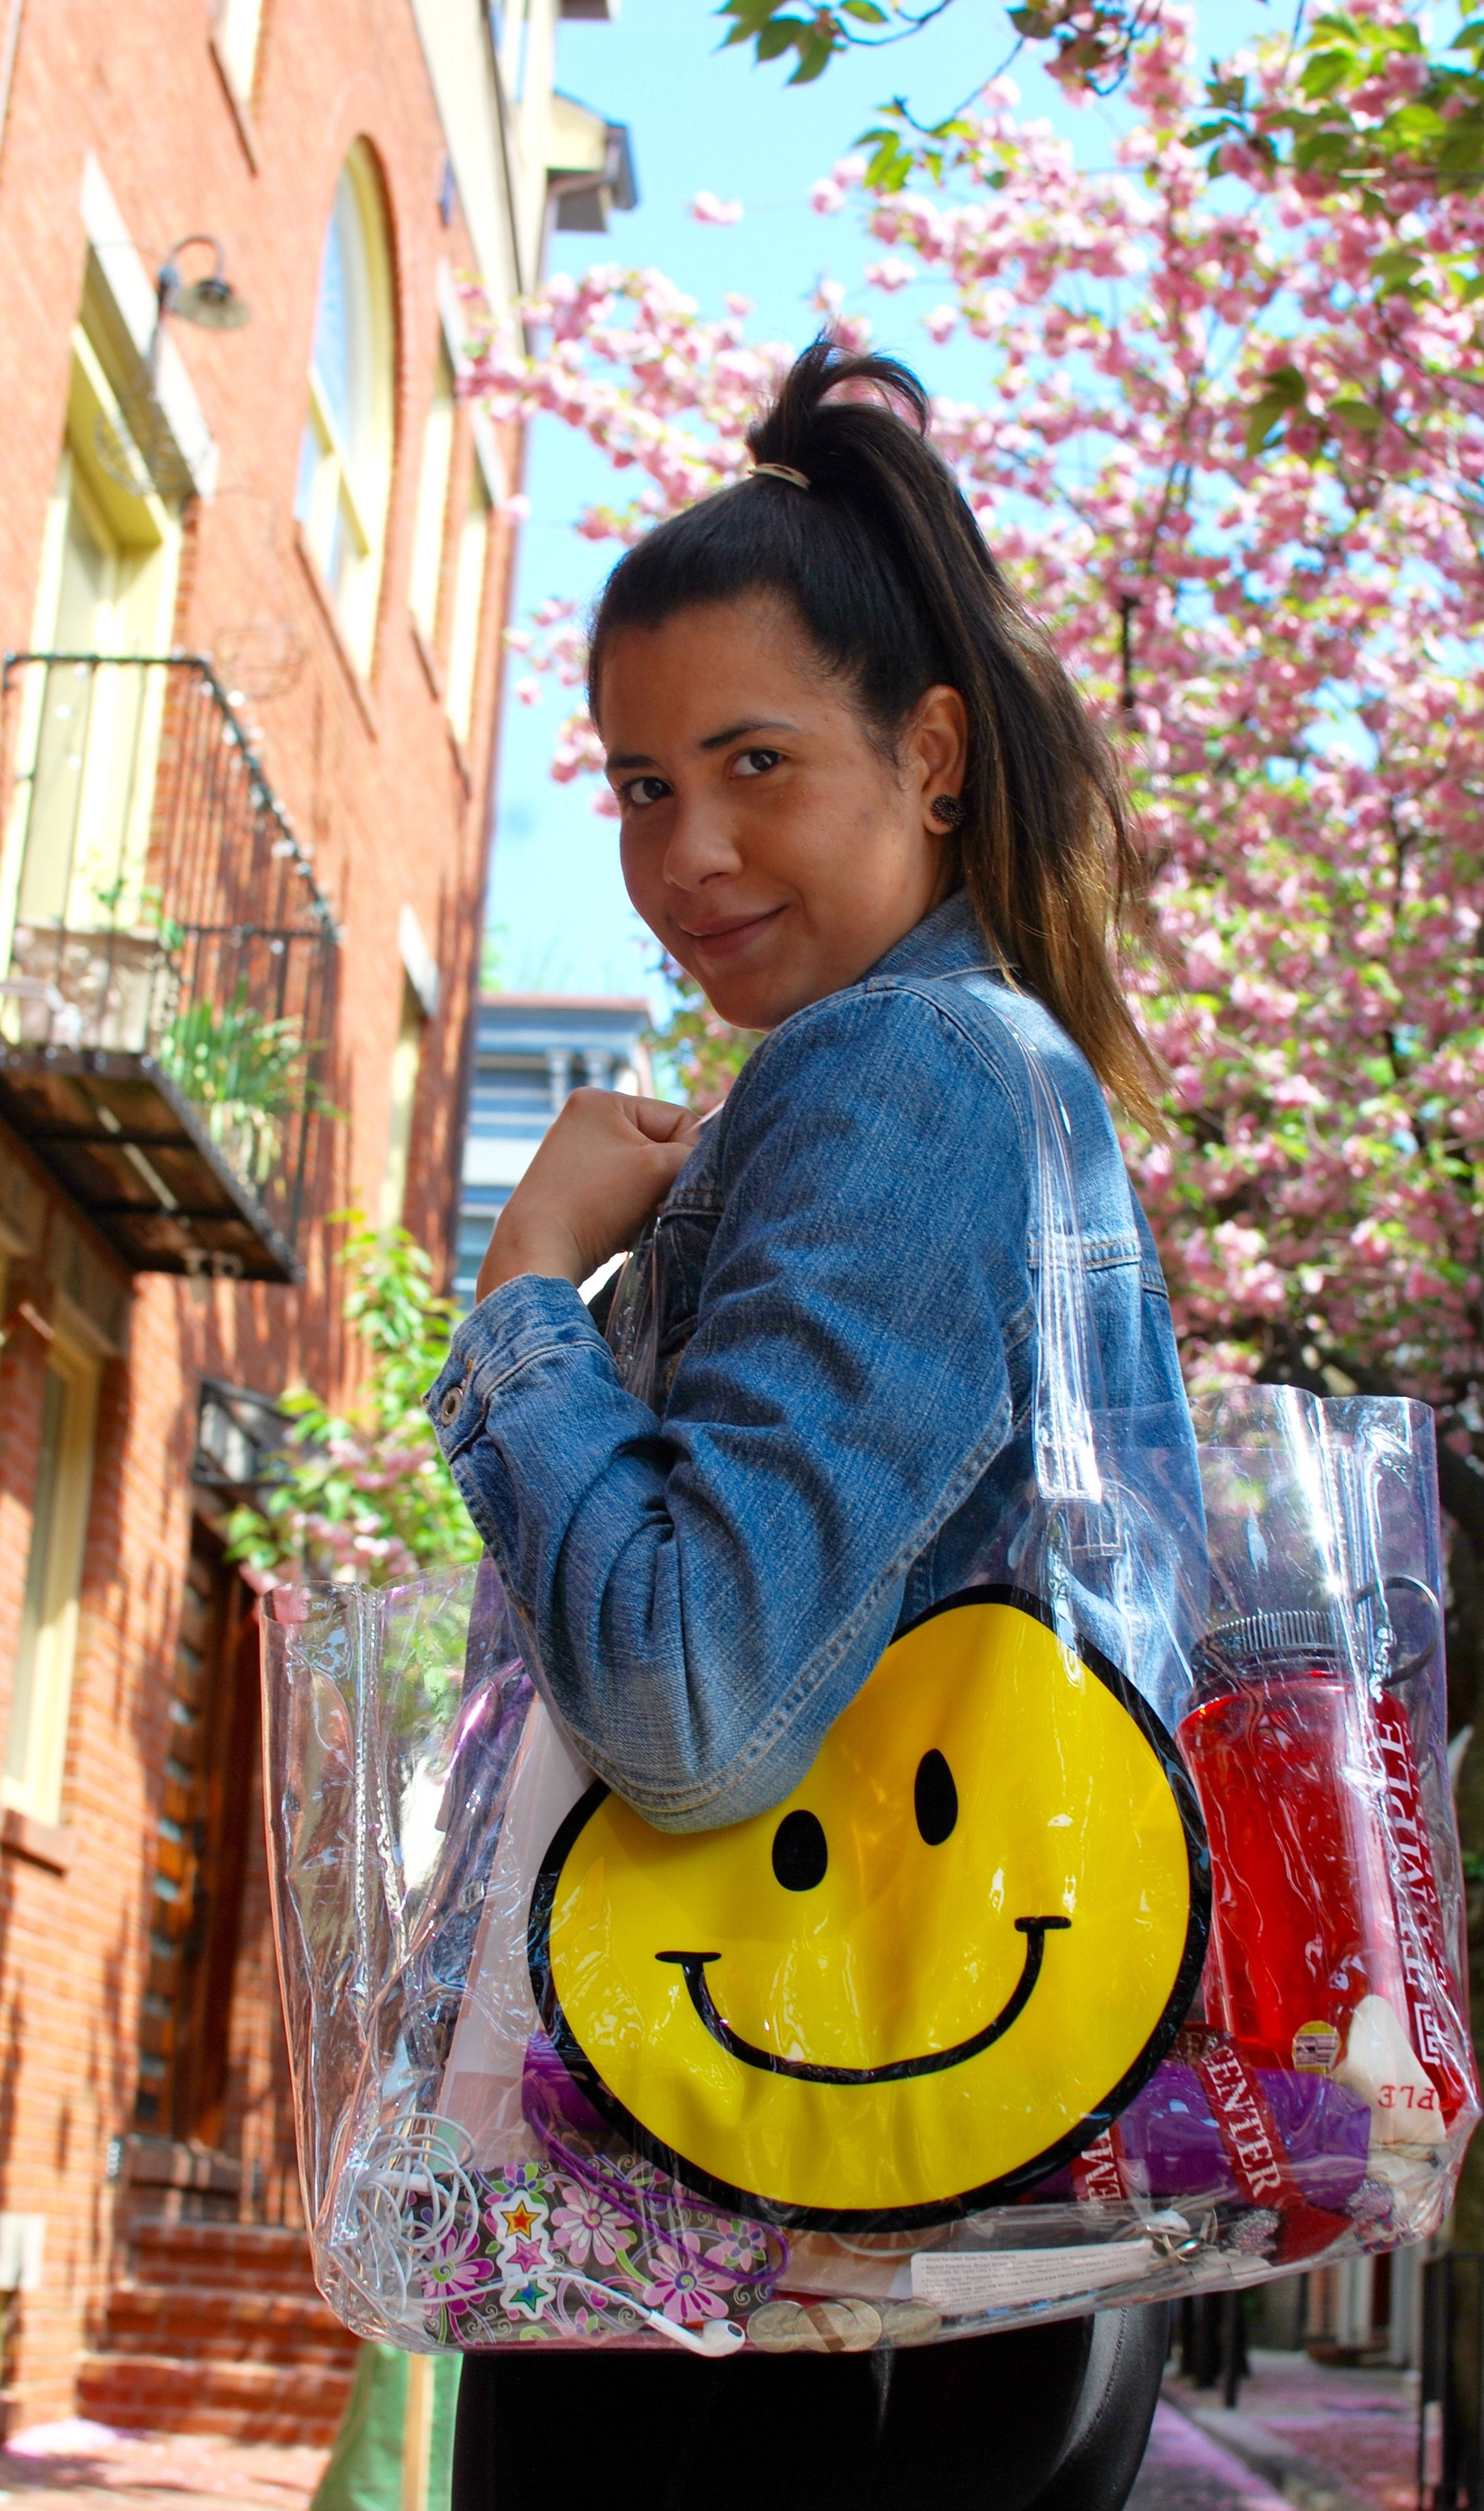 Carmen accessories denim with a smile